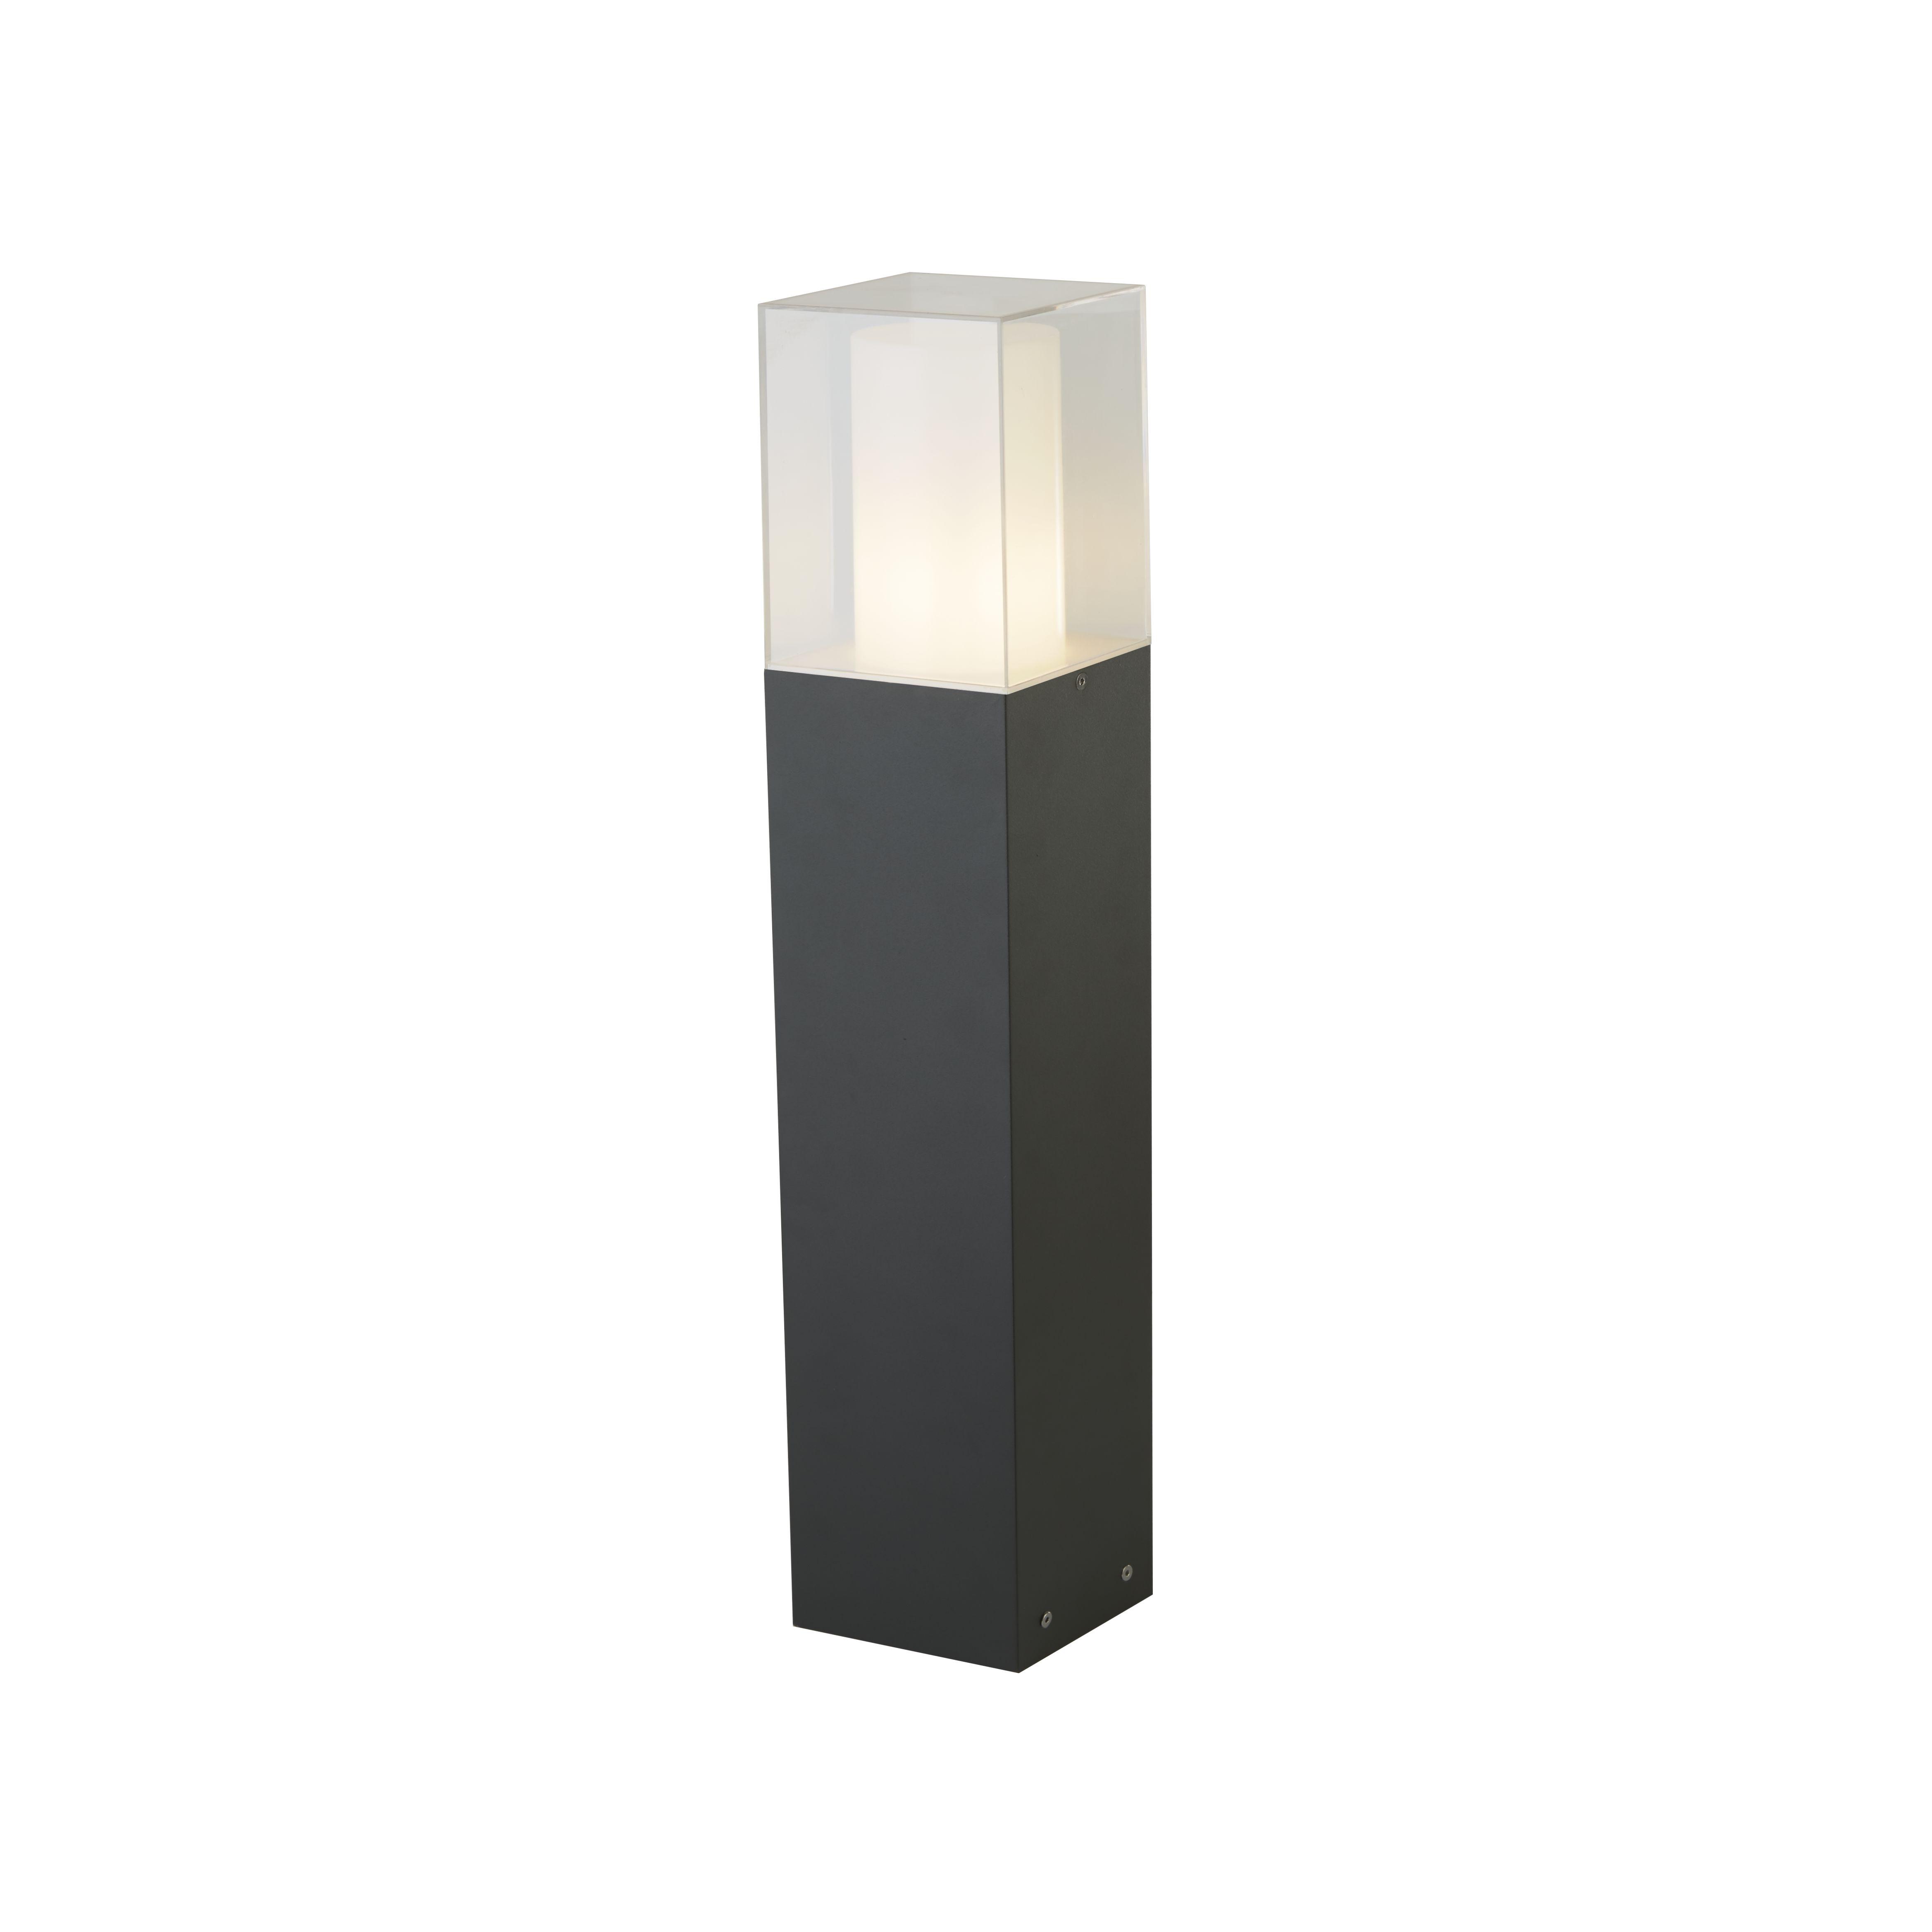 Square Outdoor Post, 450cm, Dark Grey/white